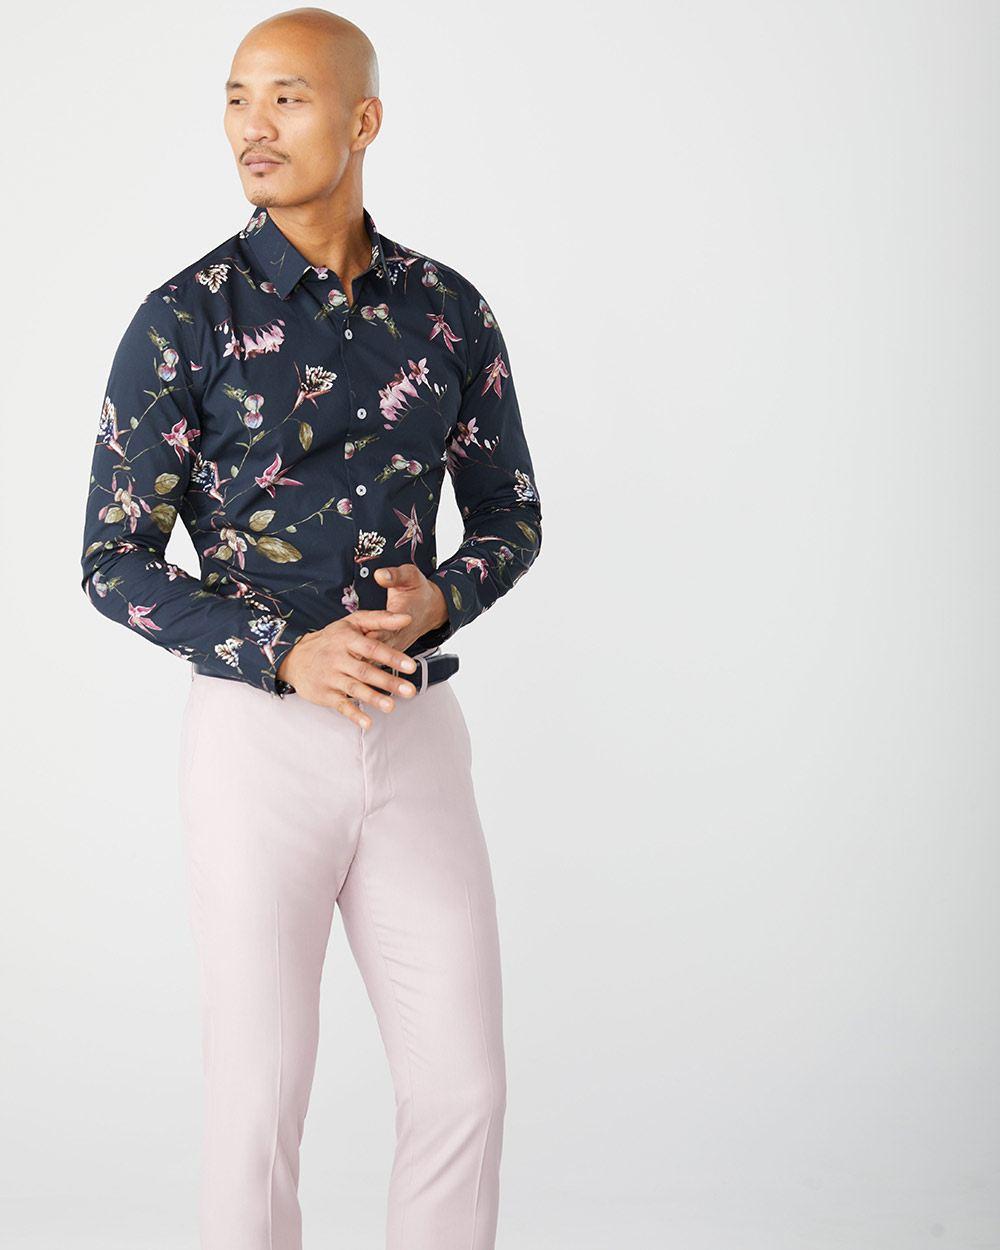 4714d1debaa46 Slim Fit navy floral dress shirt